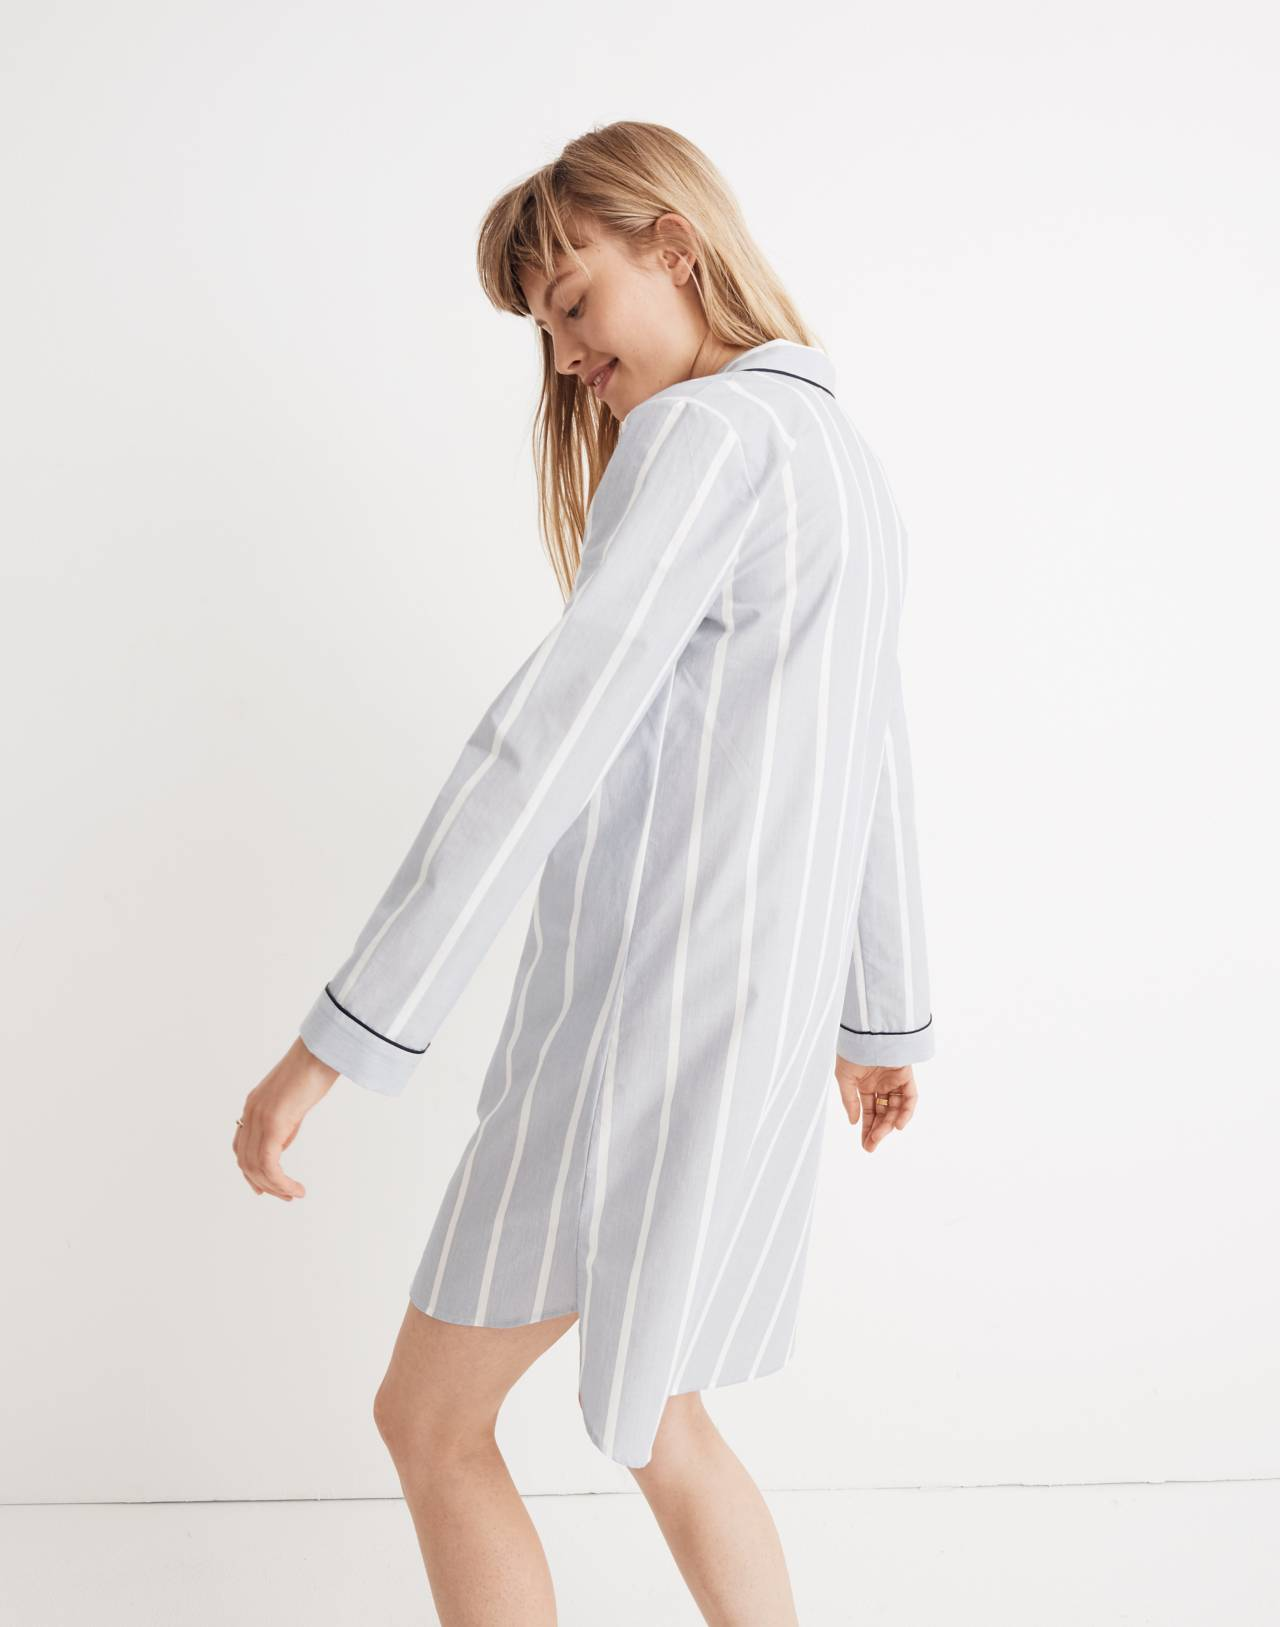 Bedtime Nightshirt in Dark Sea Stripe in dark sea image 2